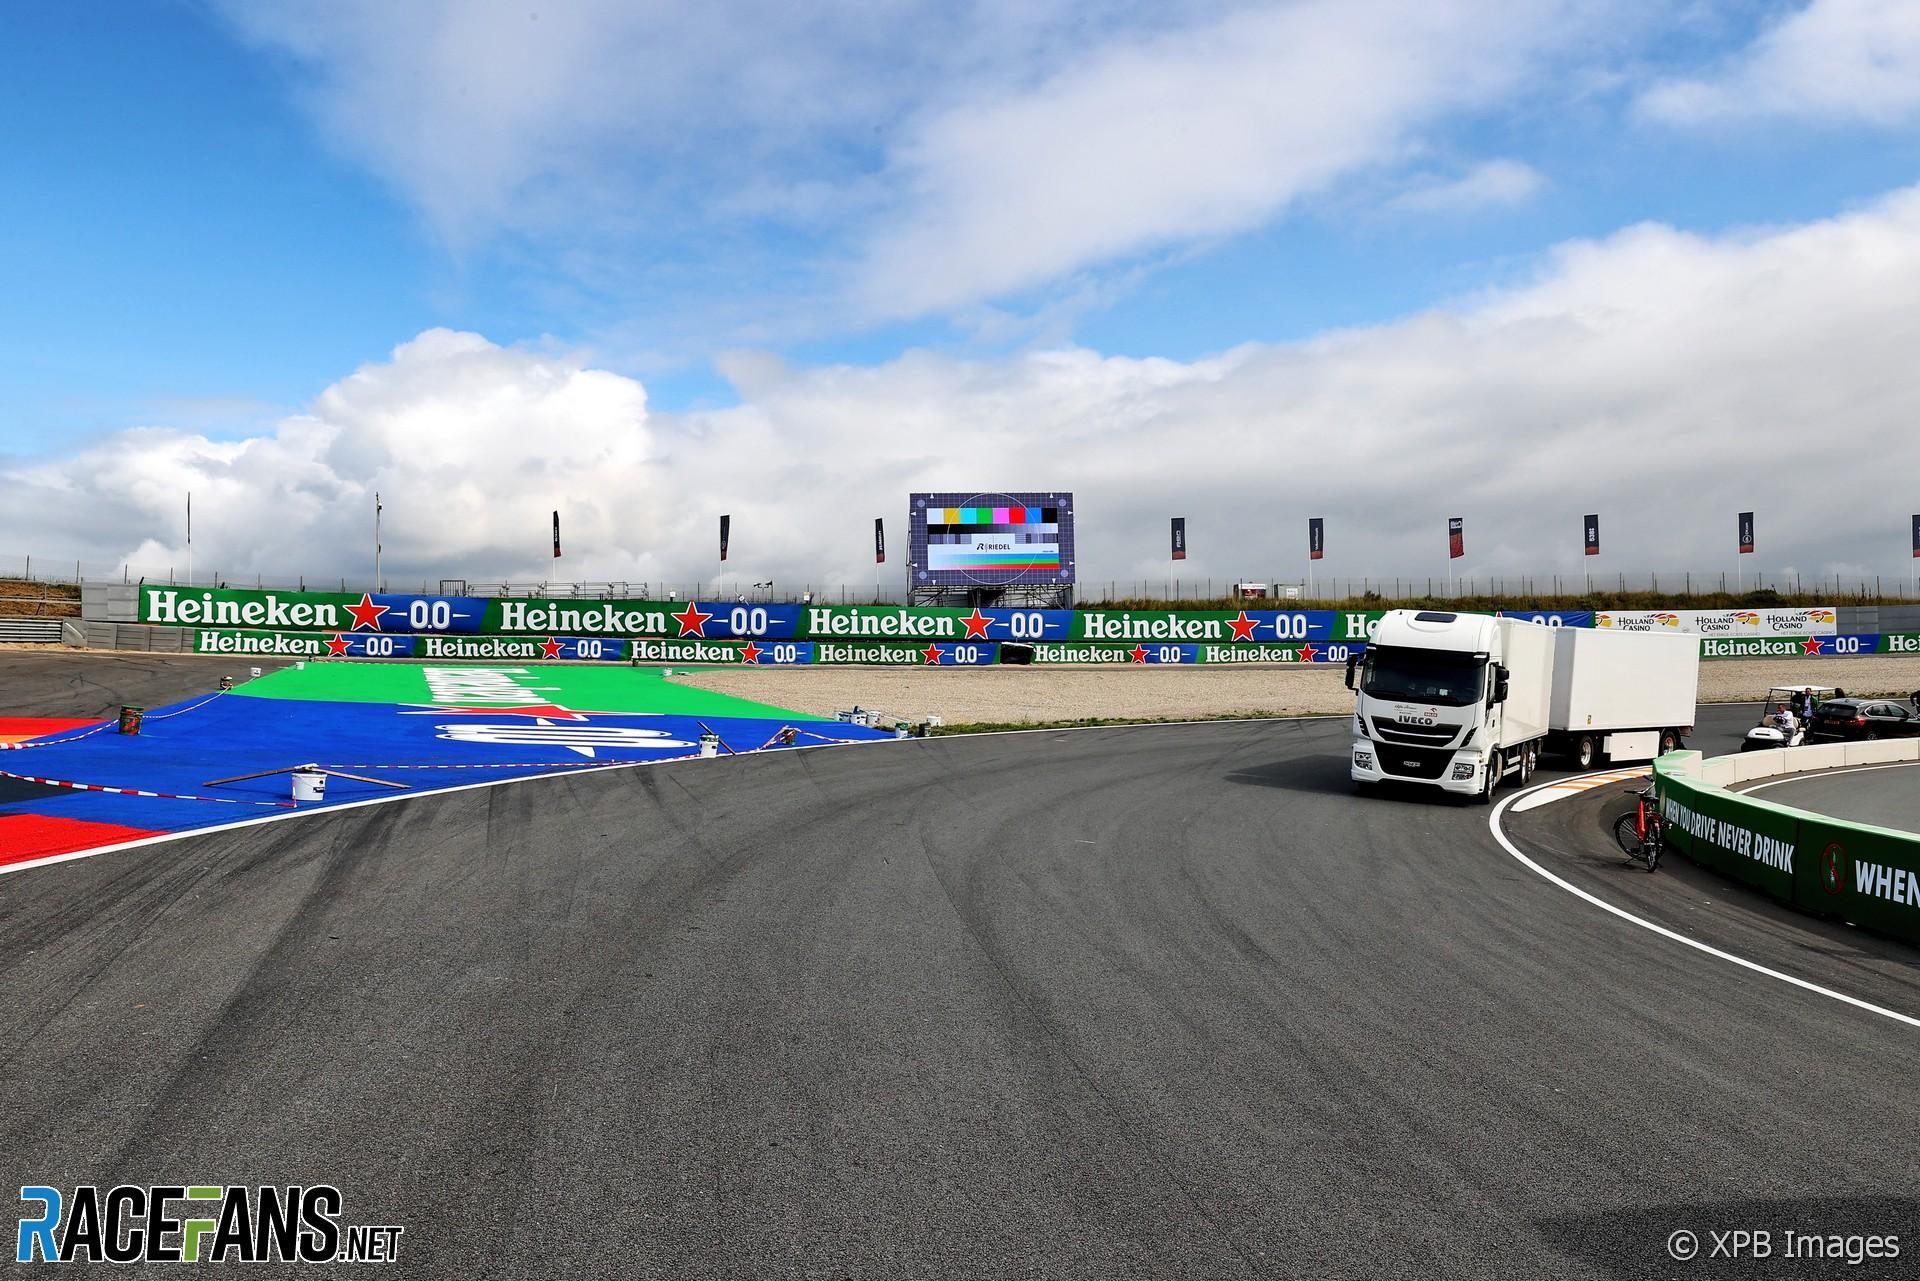 https://www.racefans.net/wp-content/uploads/2021/09/racefansdotnet-21-09-02-08-10-55-9.jpg